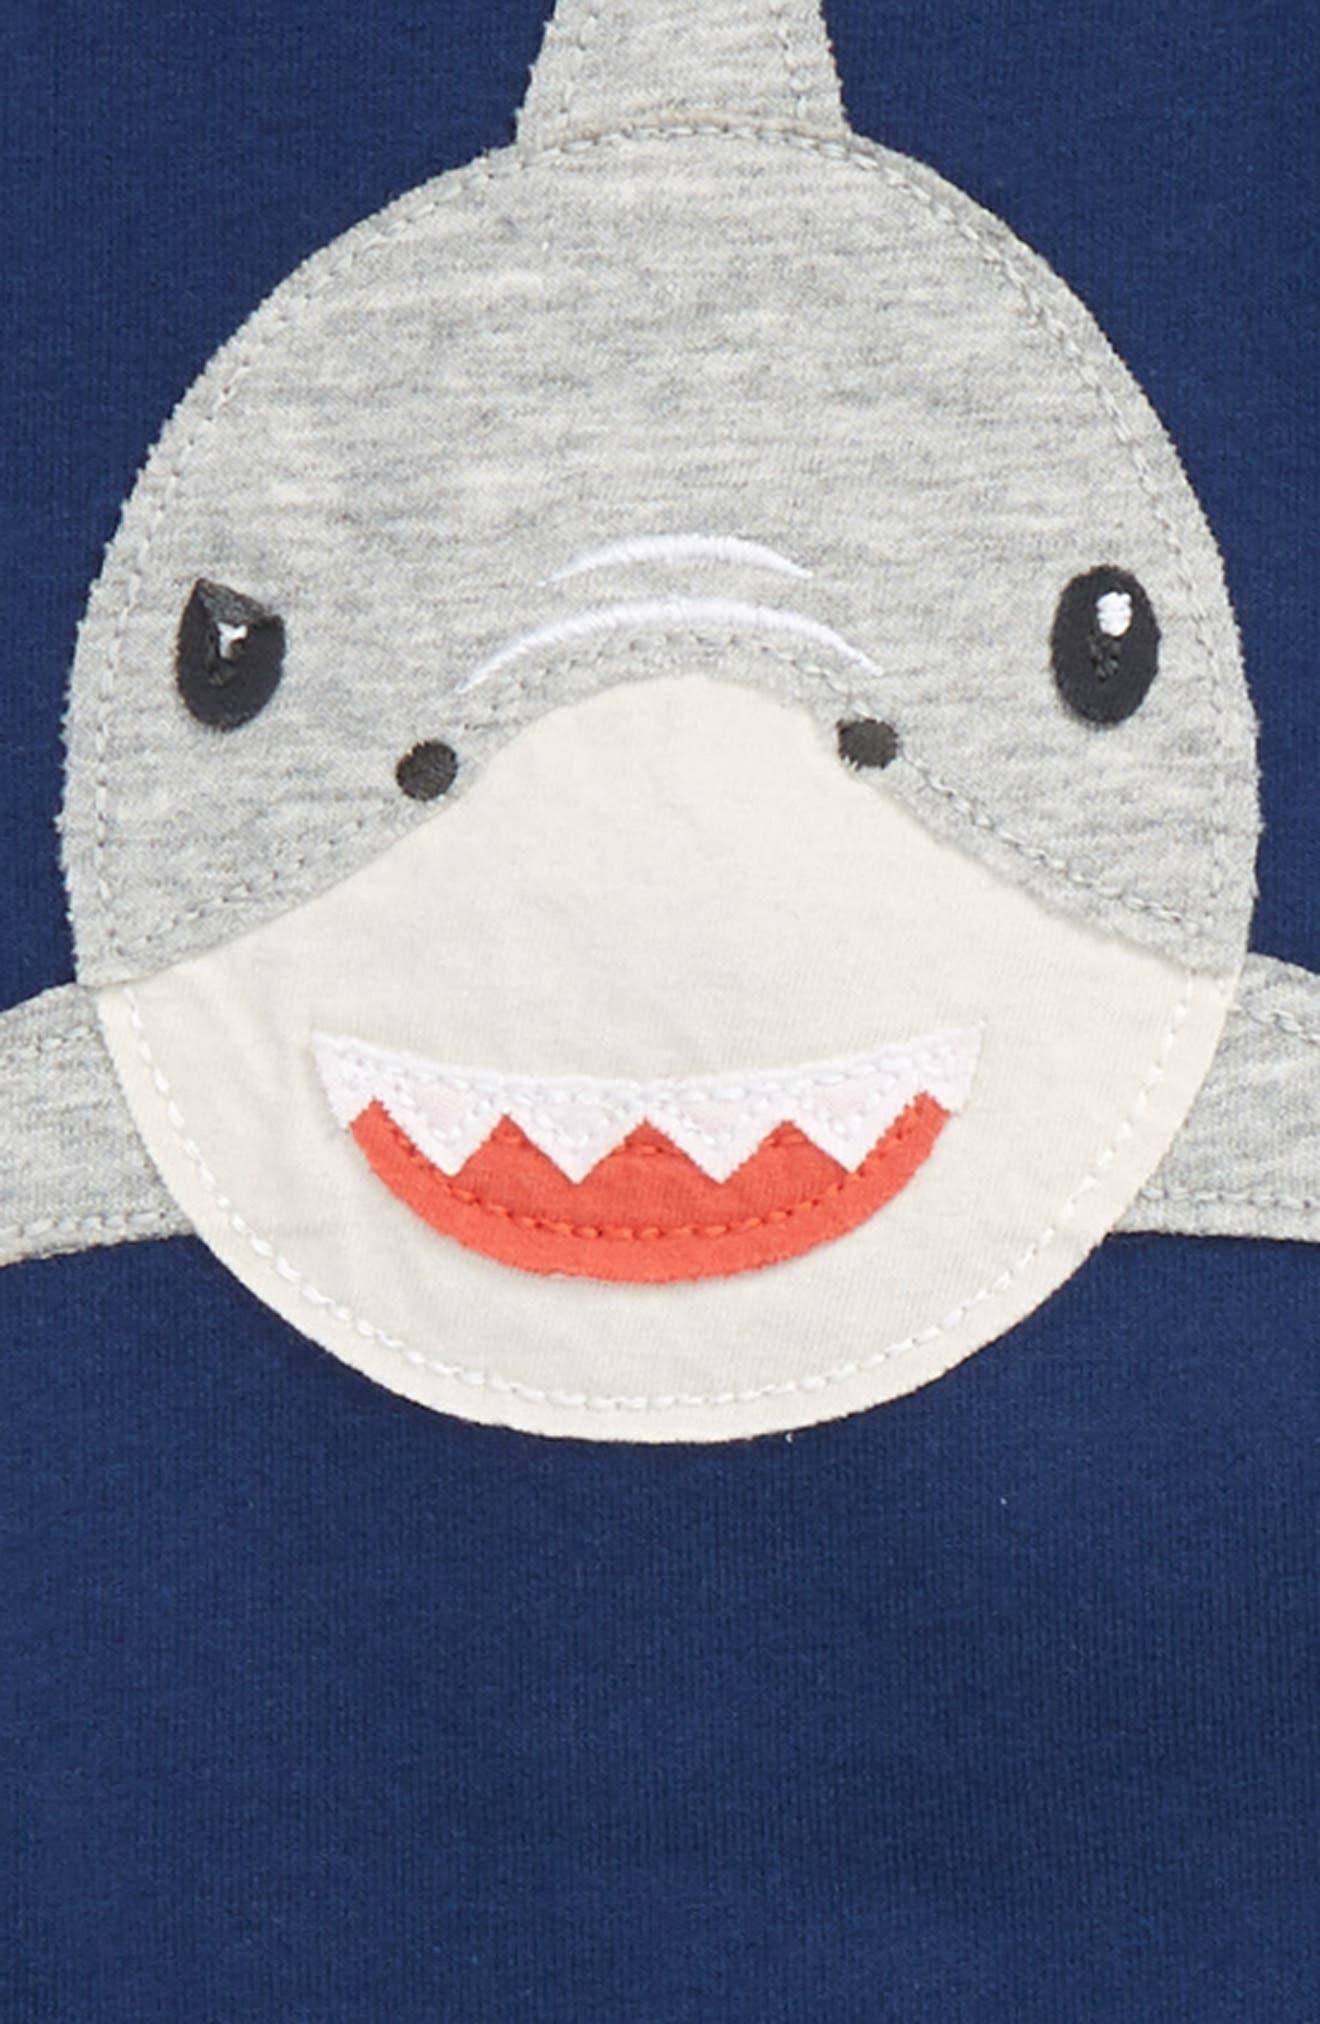 Fun Shark Appliqué Jersey Shirt & Pants Set,                             Alternate thumbnail 2, color,                             Beacon Blue Shark